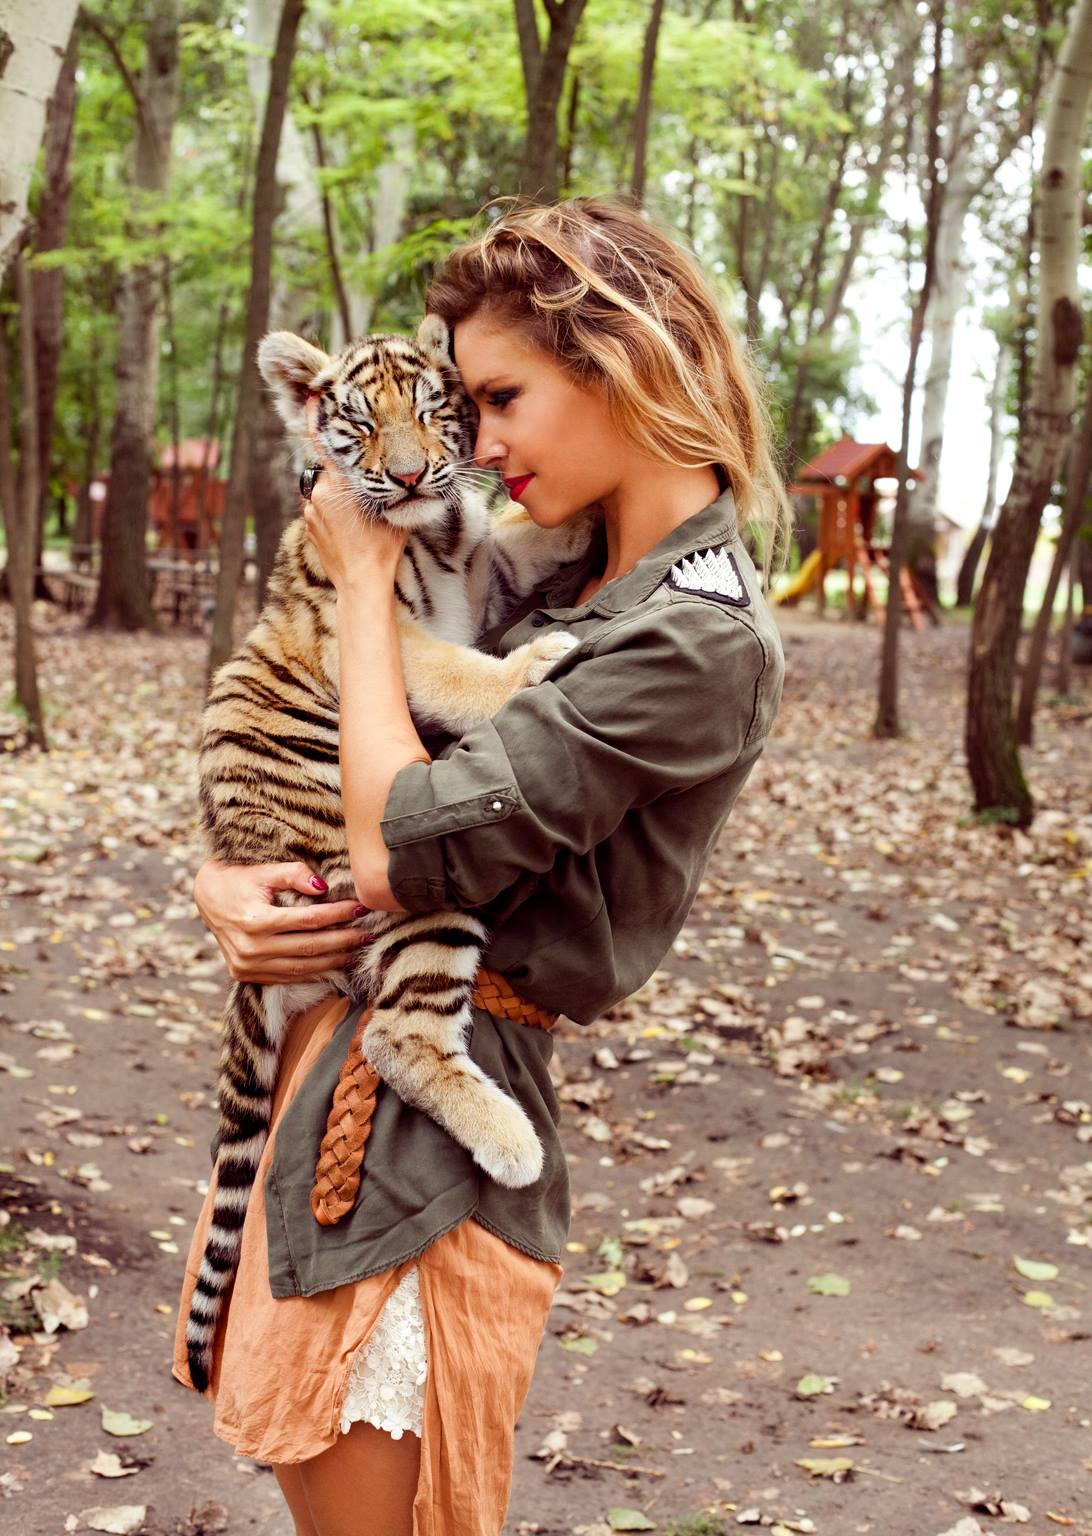 Although tiger cubsaren'texactly terrifying...